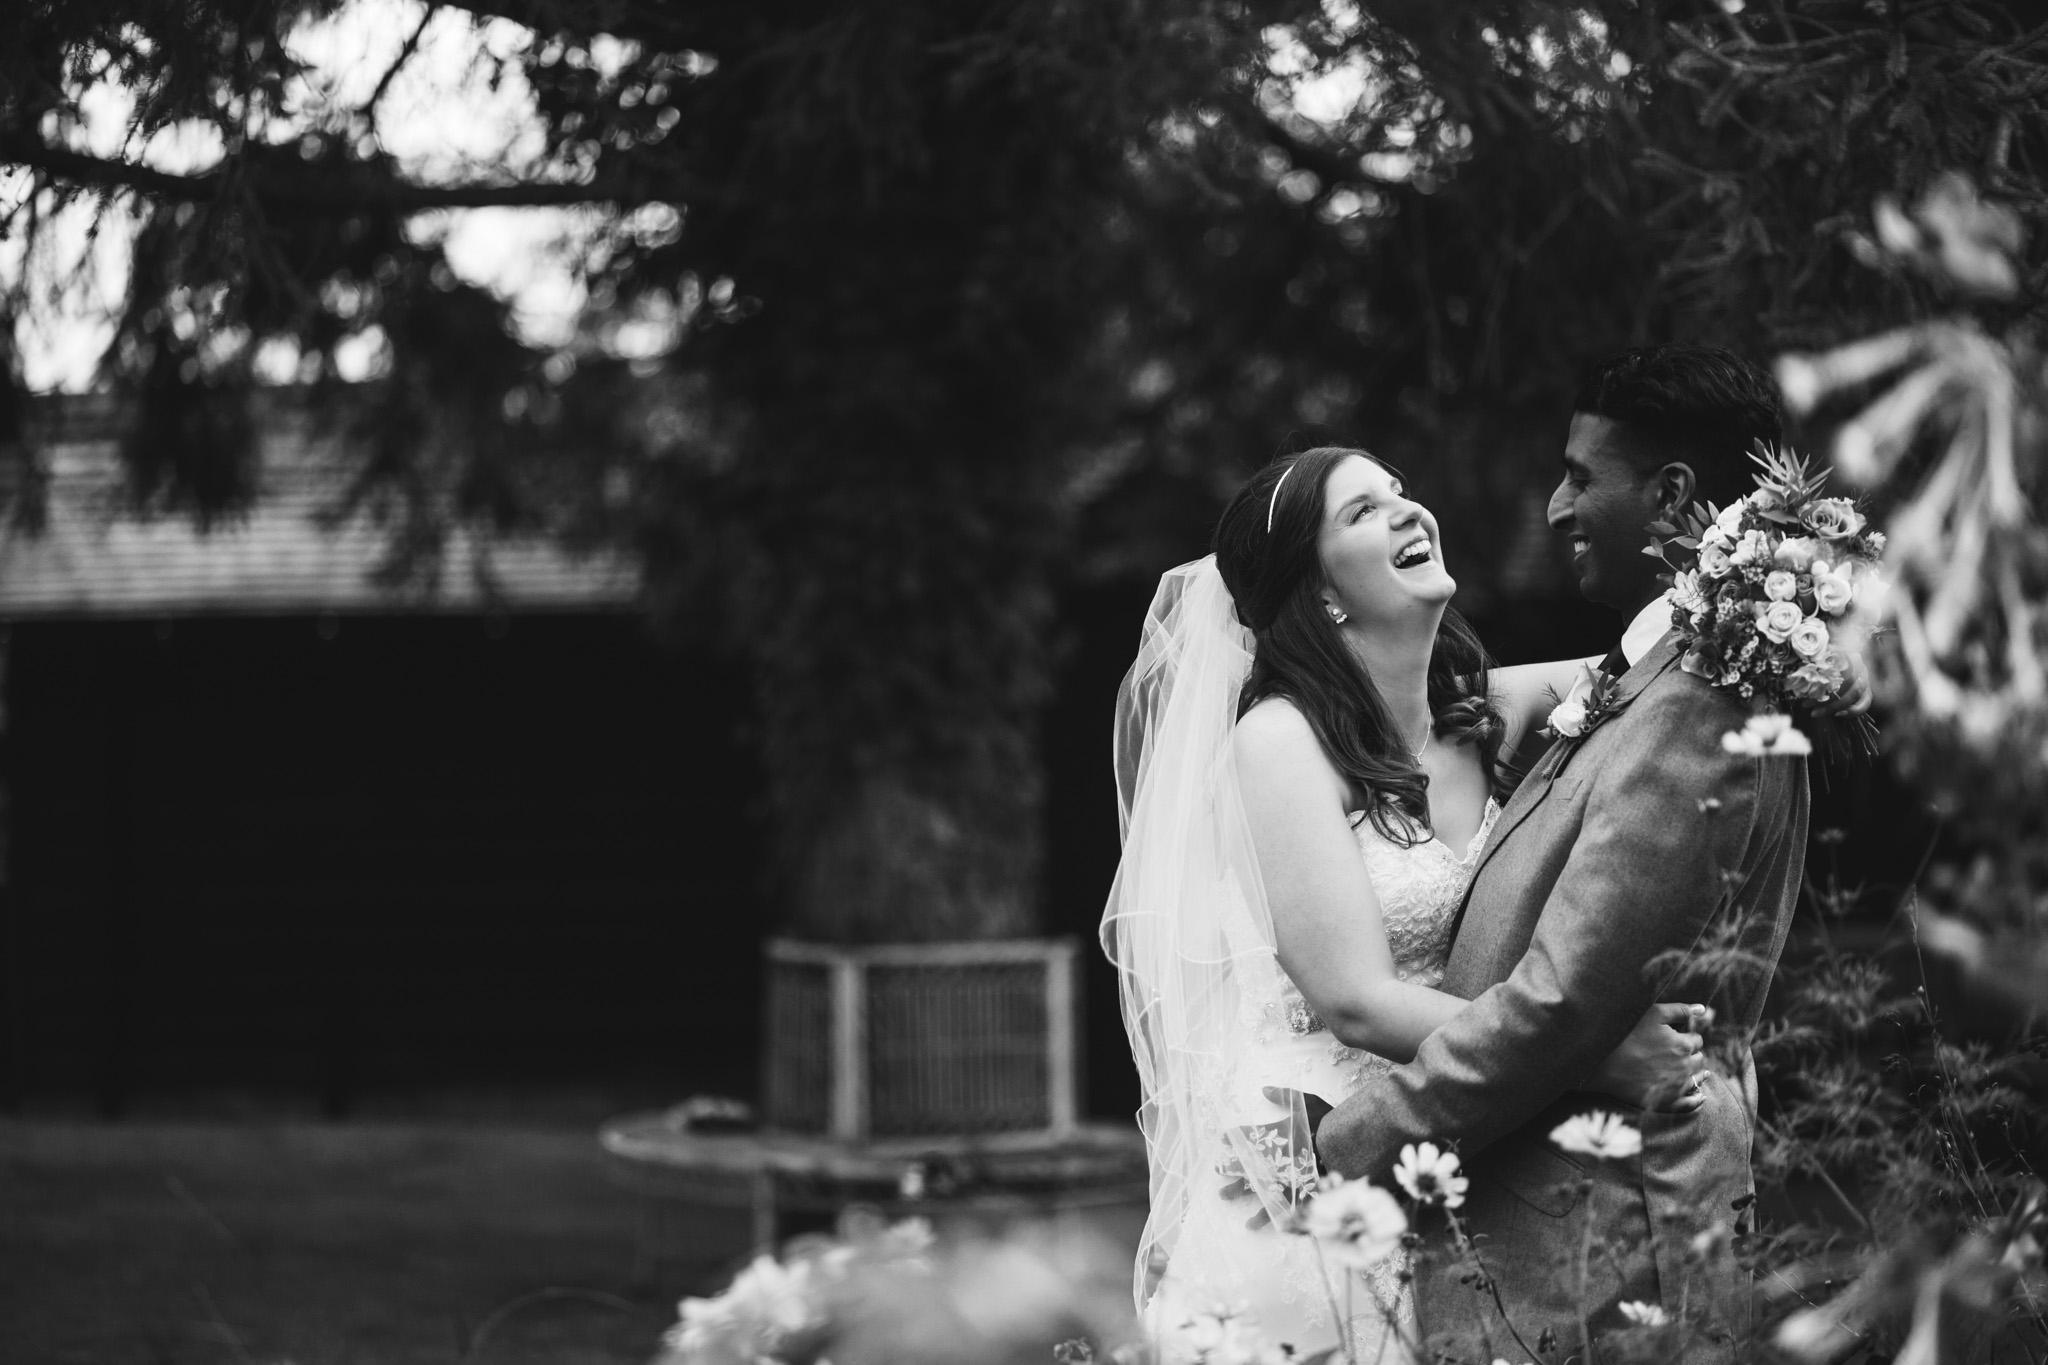 cat-lane-weddings__sheene-mill-wedding-photography__clw__1602__38A7947.jpg